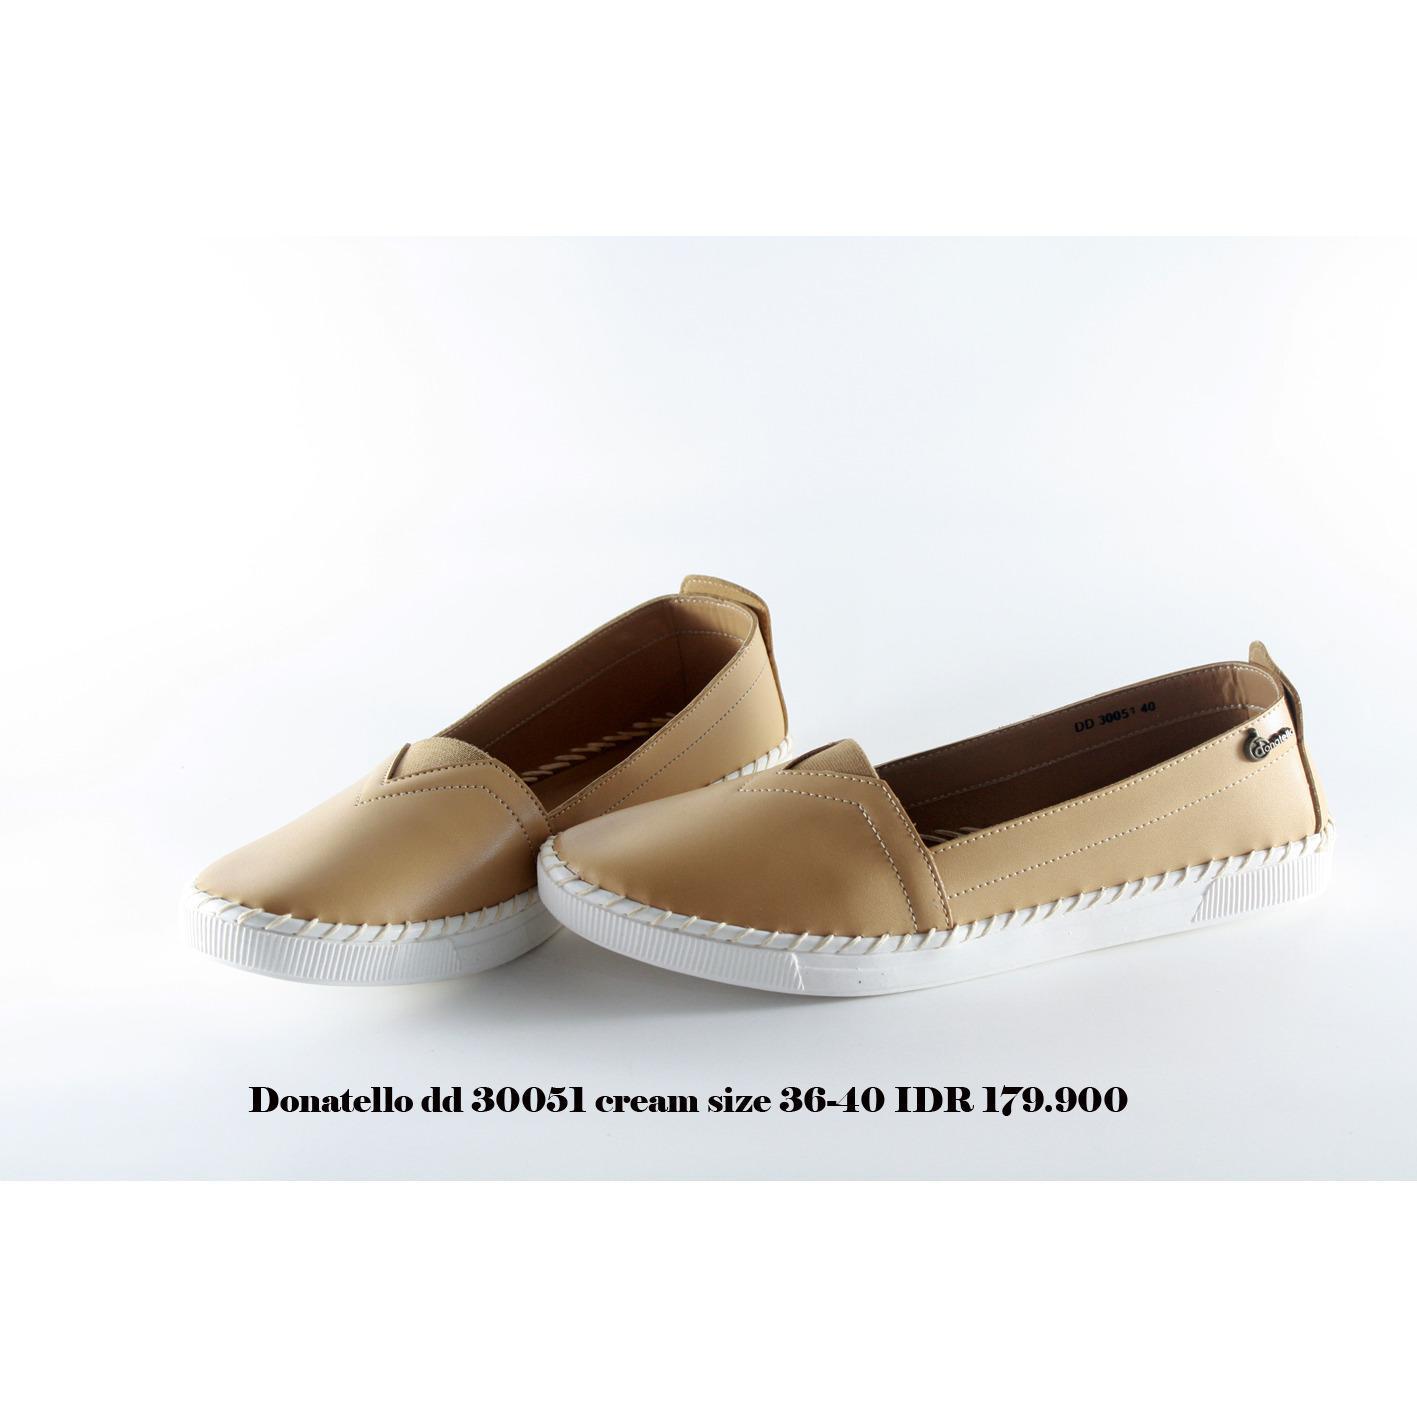 donatello dd 30051 sepatu kets wanita cream